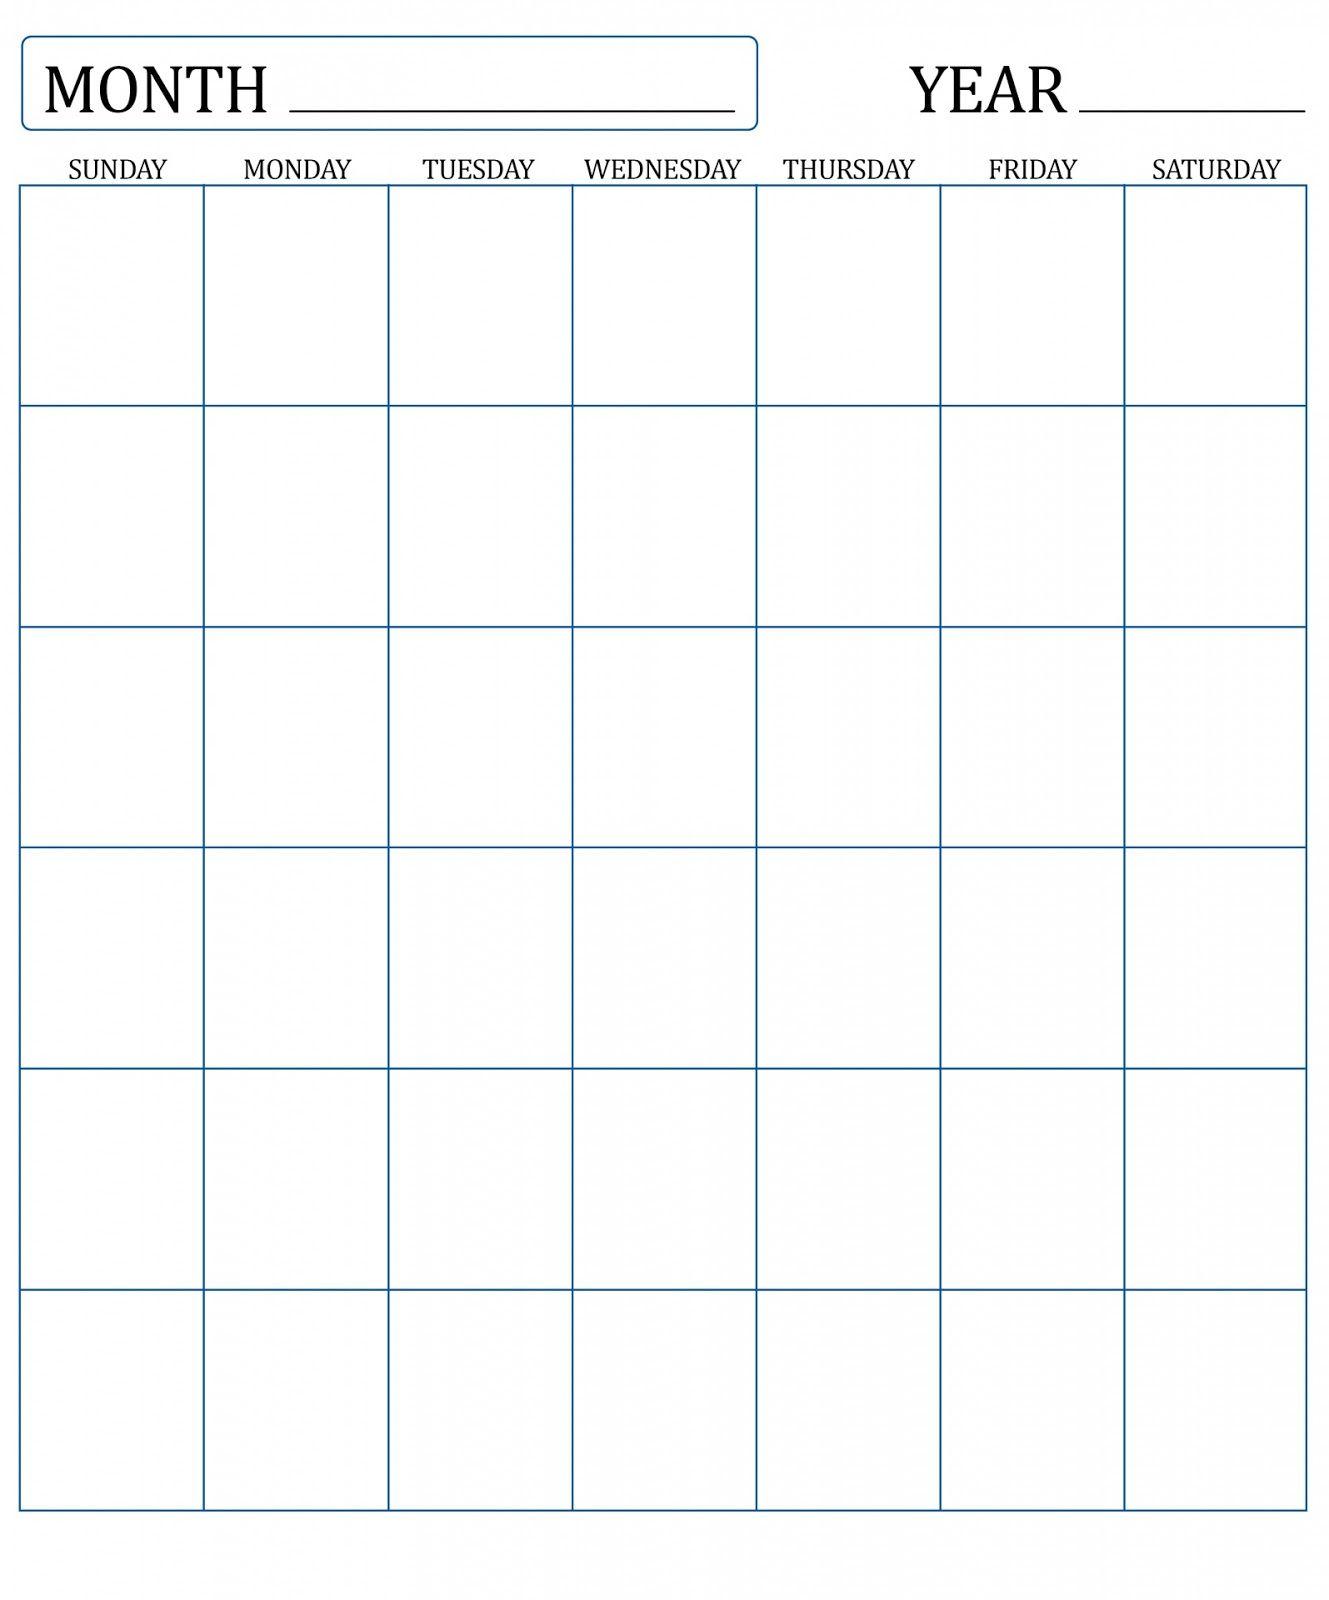 Calendar planner 2017 Awesome